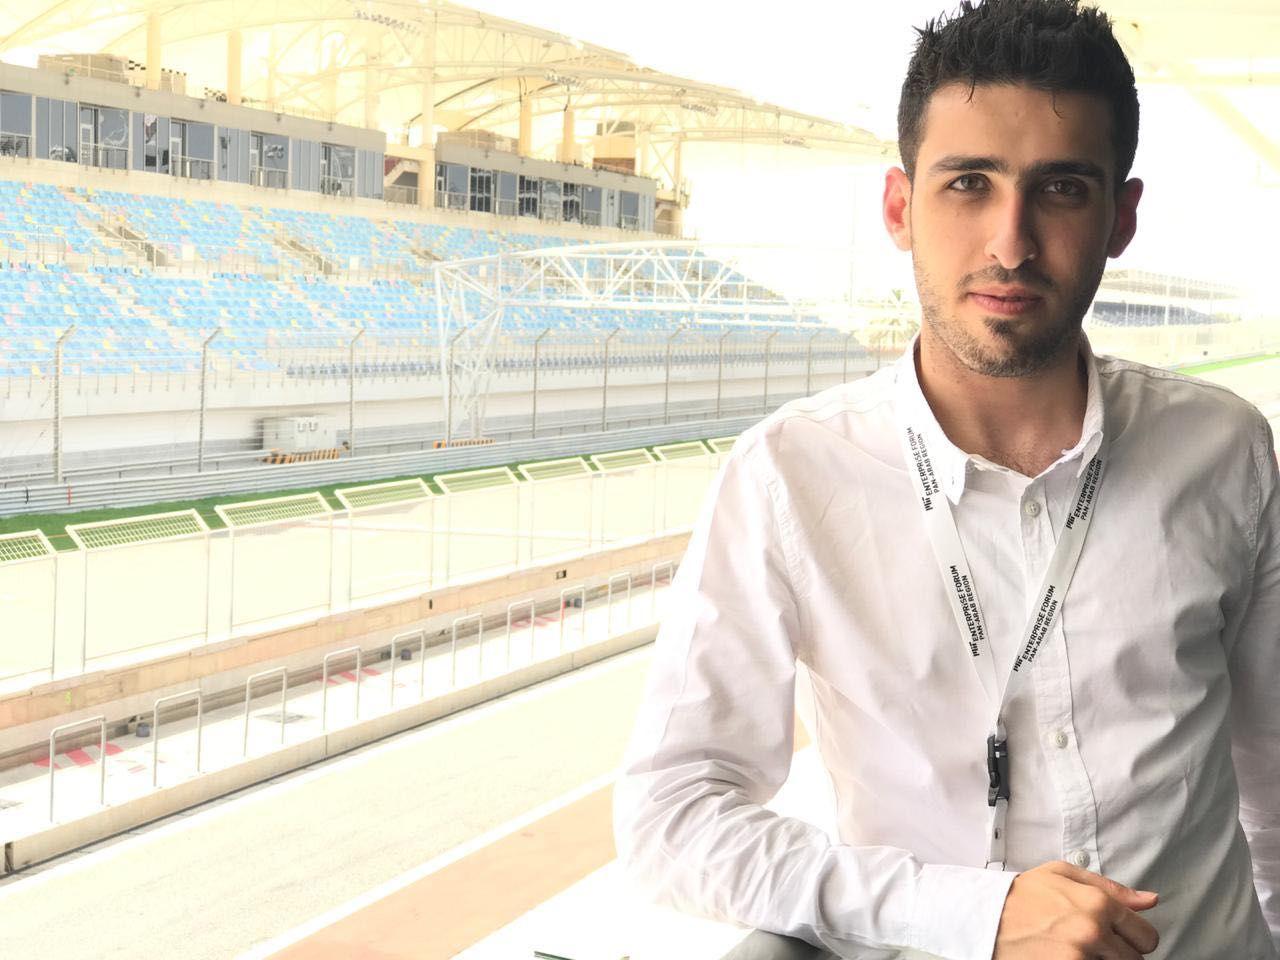 In conversation with Sami Al Ahmad of Marj3